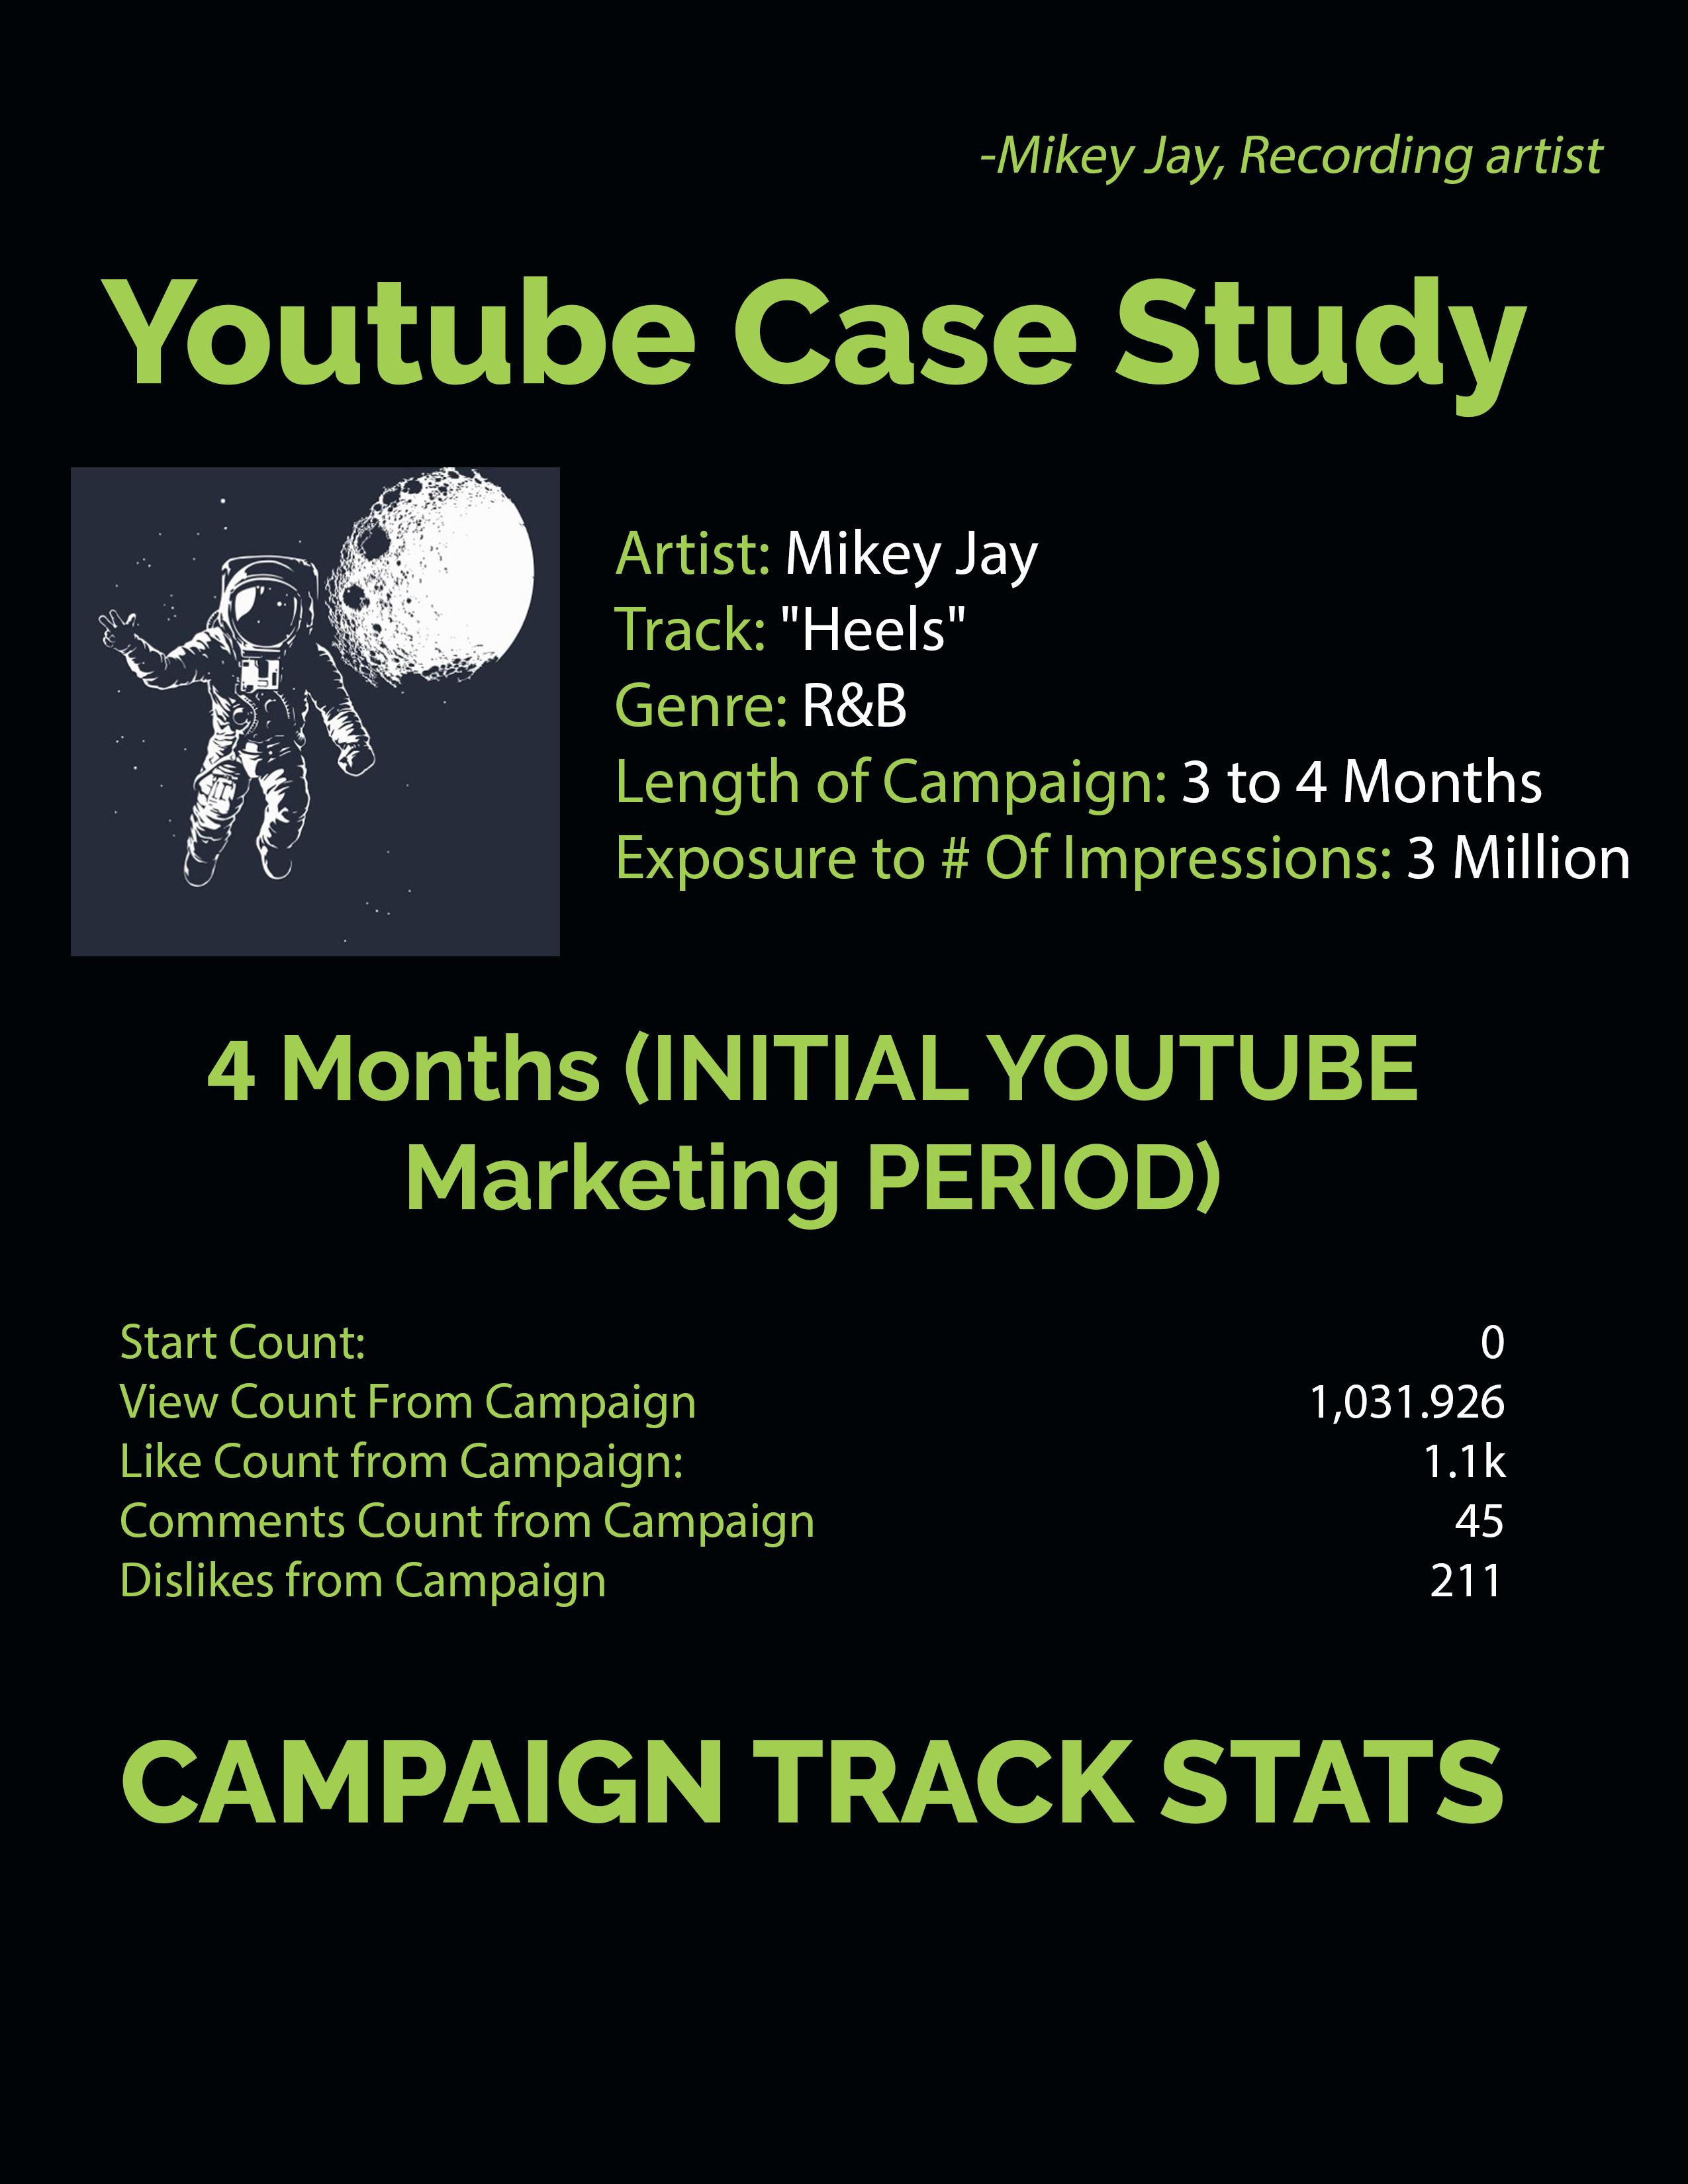 youtube-case-study1.jpg